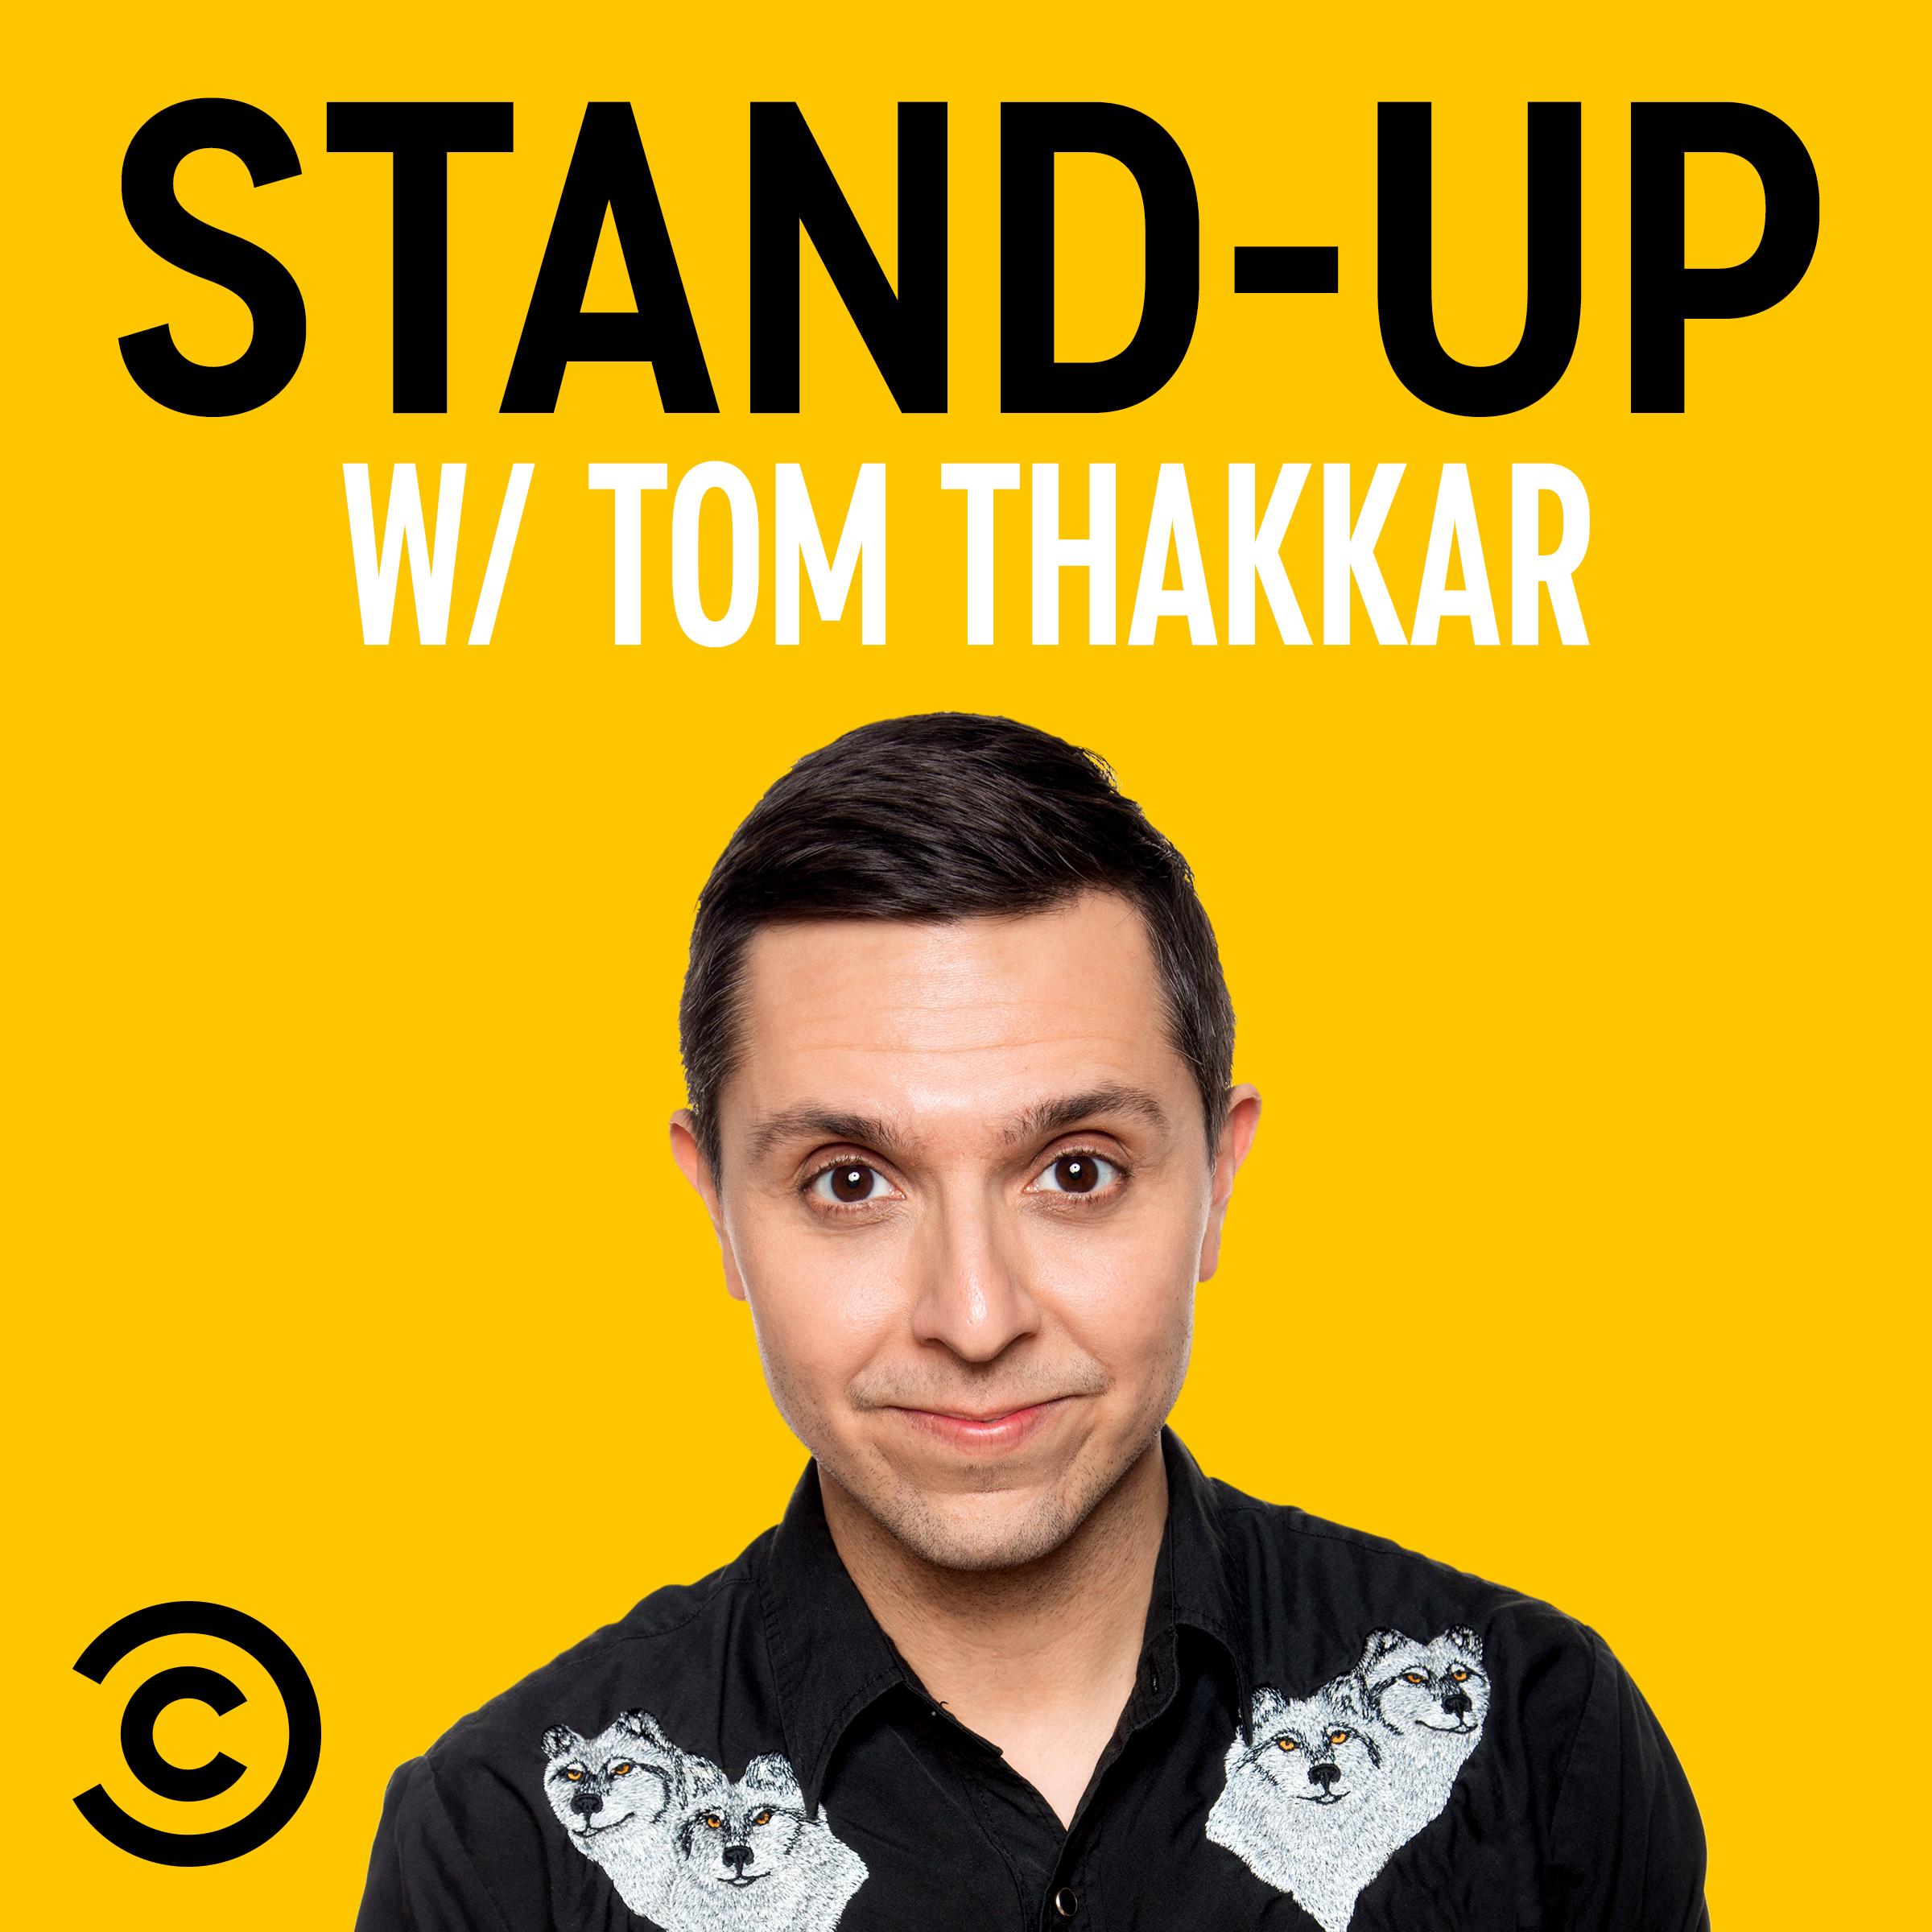 Stand-Up w/ Tom Thakkar podcast